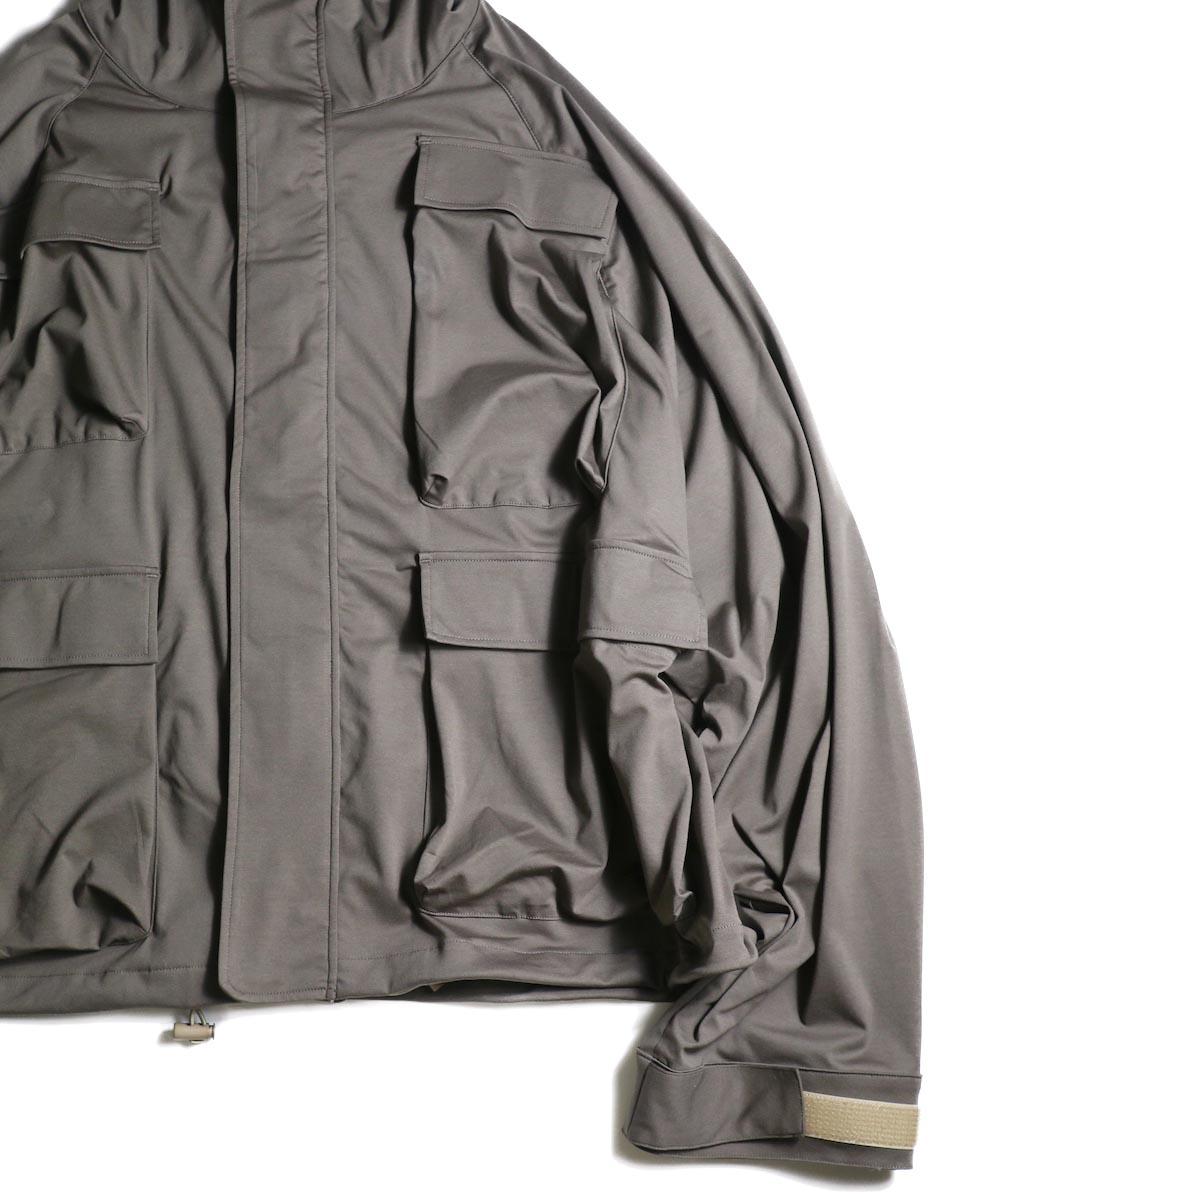 BASISBROEK / FORCE (Khaki)袖、裾